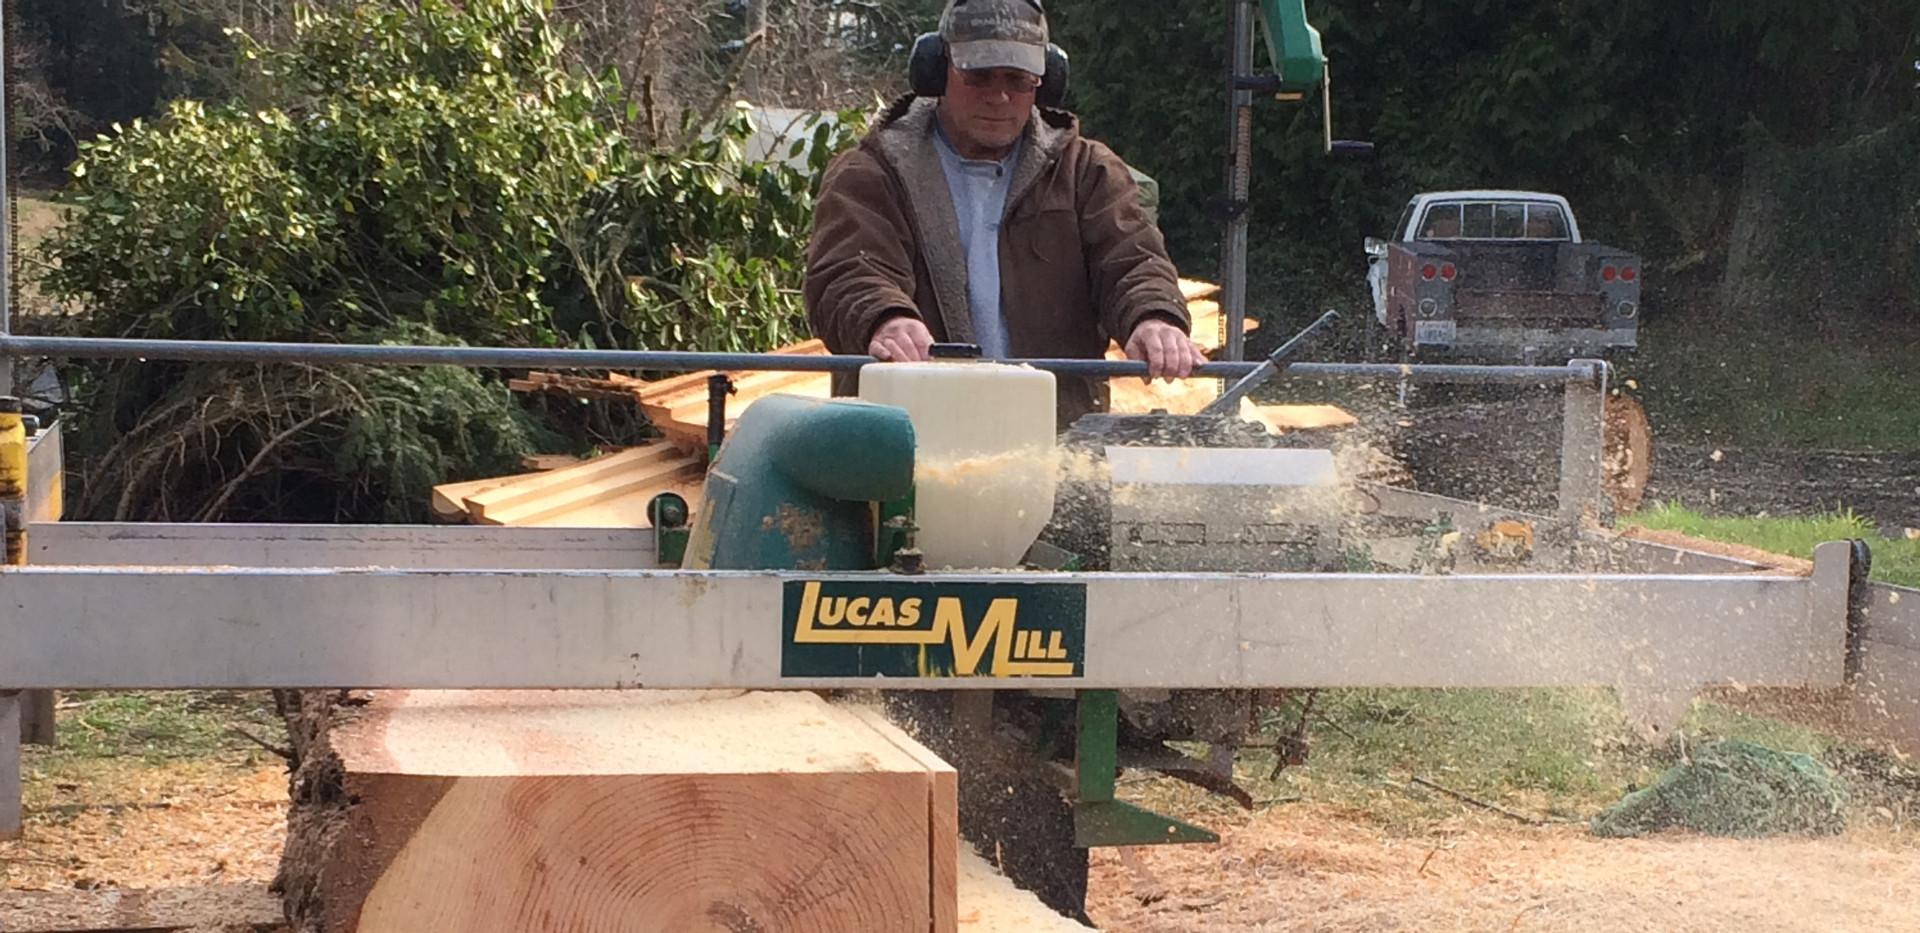 Lucas Mill